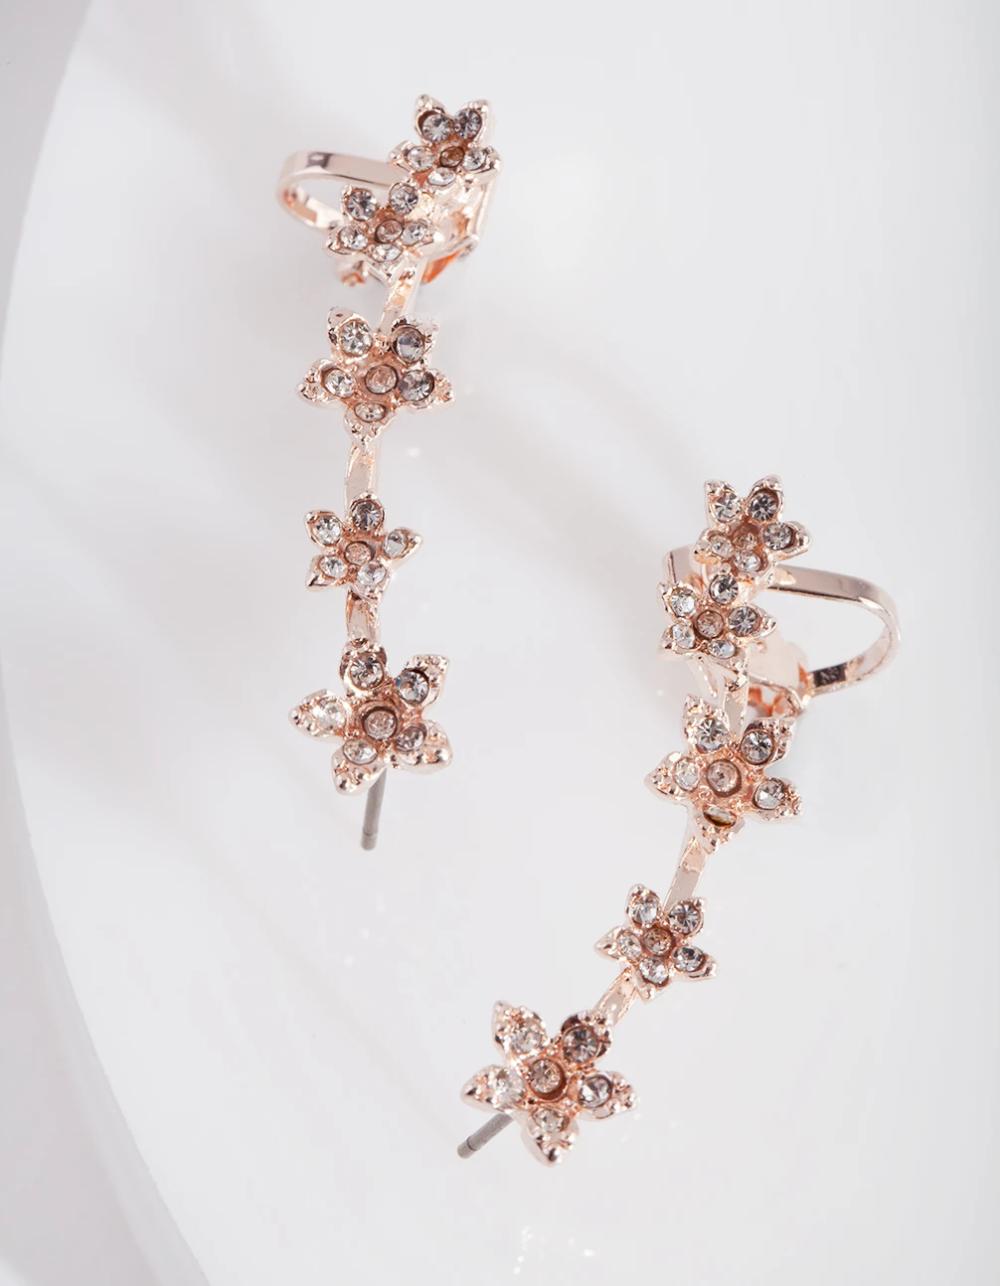 Rose Gold Diamante Flower Ear Cuff Flower Ear Cuffs Ear Cuff Flower Ear